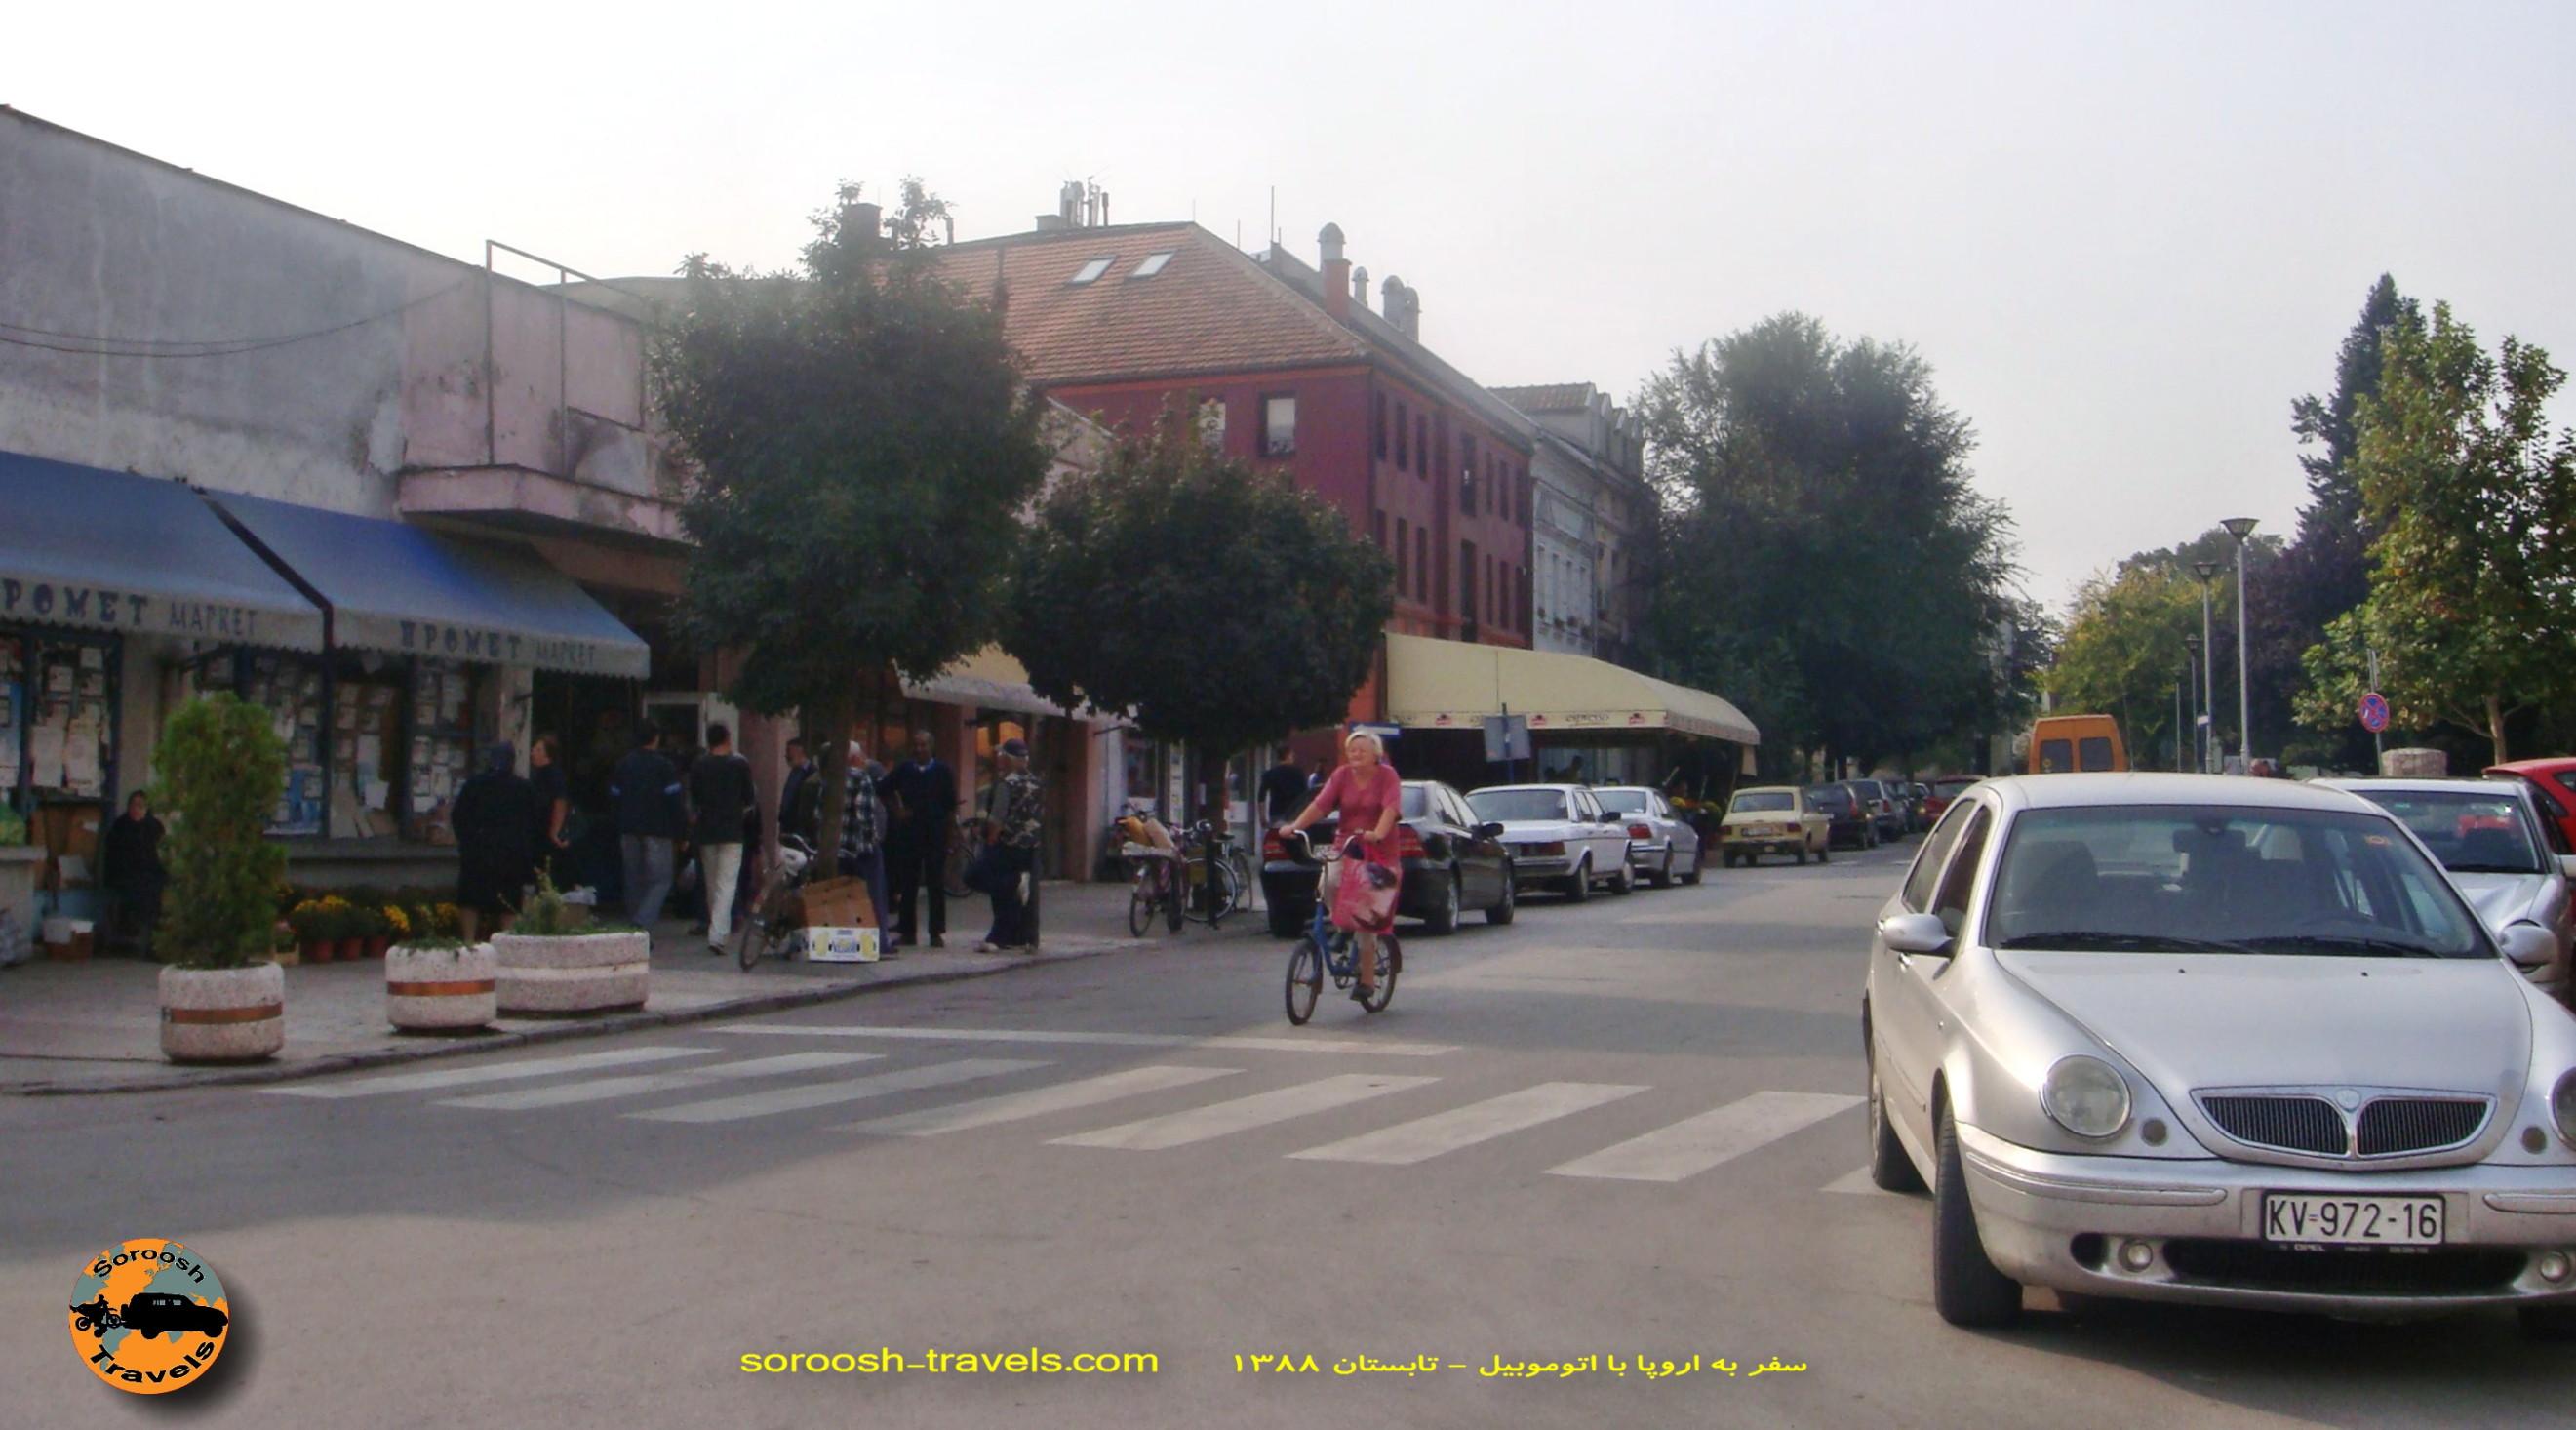 07-mehr-1388-29-september-2009-banatskapalanka-in-serbia-to-sofia-in-bulgaria-14